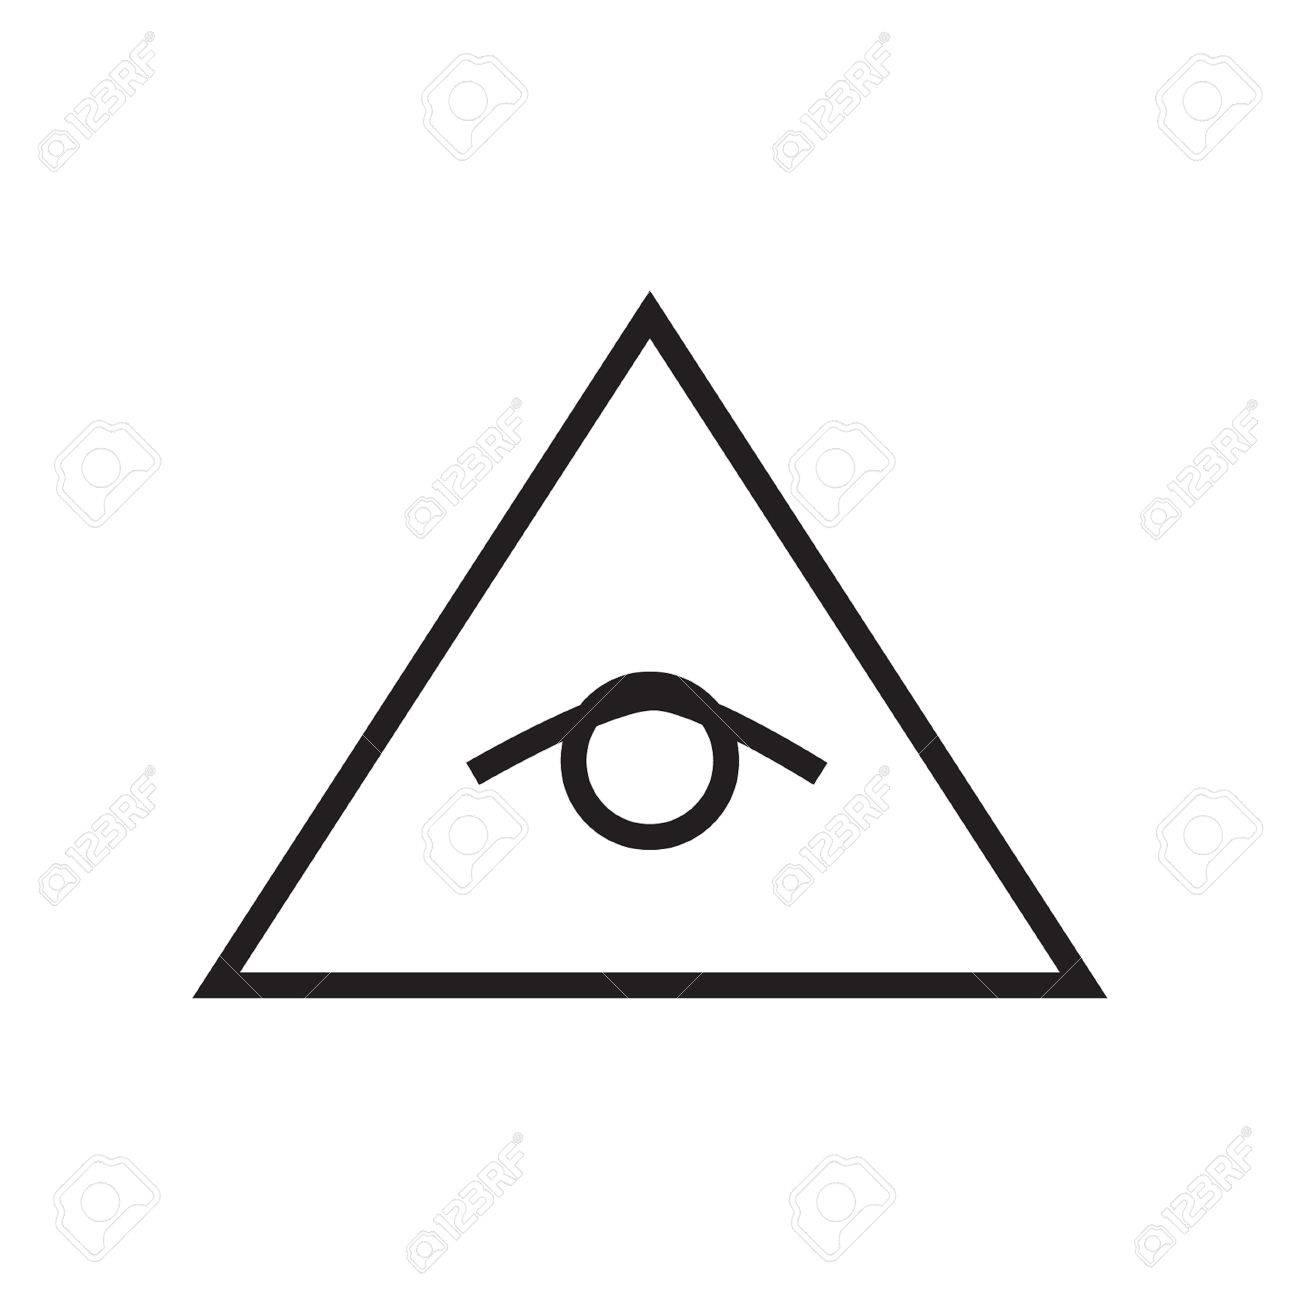 All Seeing Eye Pyramid Vector Line Illustration Icon Symbol Poster Freemason And